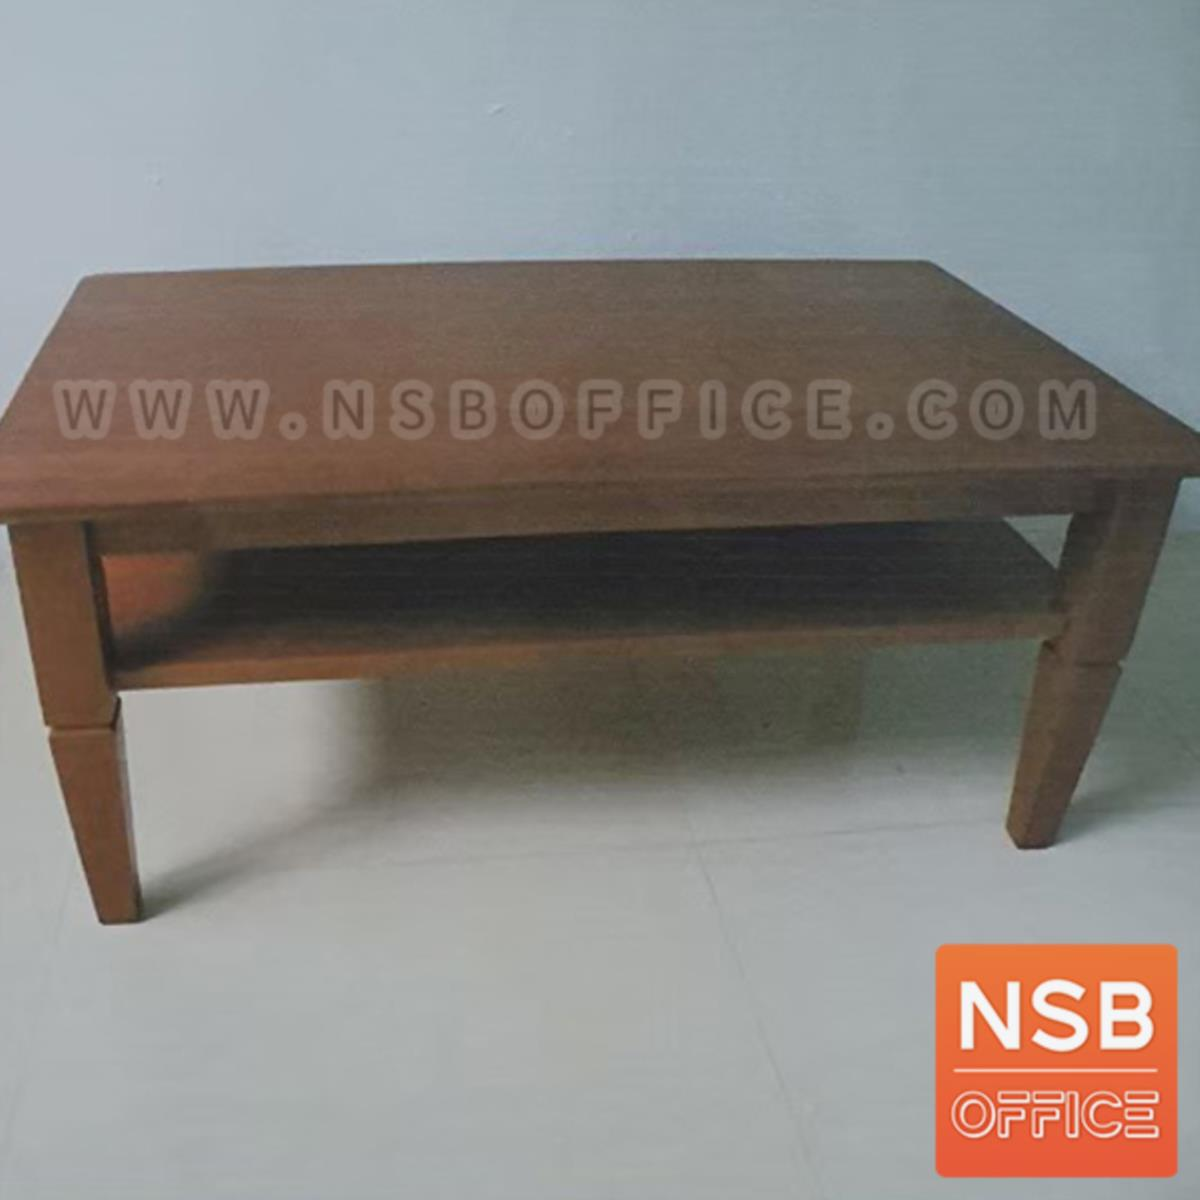 G20A008:โต๊ะกลางไม้ยางพารา รุ่น Braelyn (แบรลิน) ขนาด 100W cm.